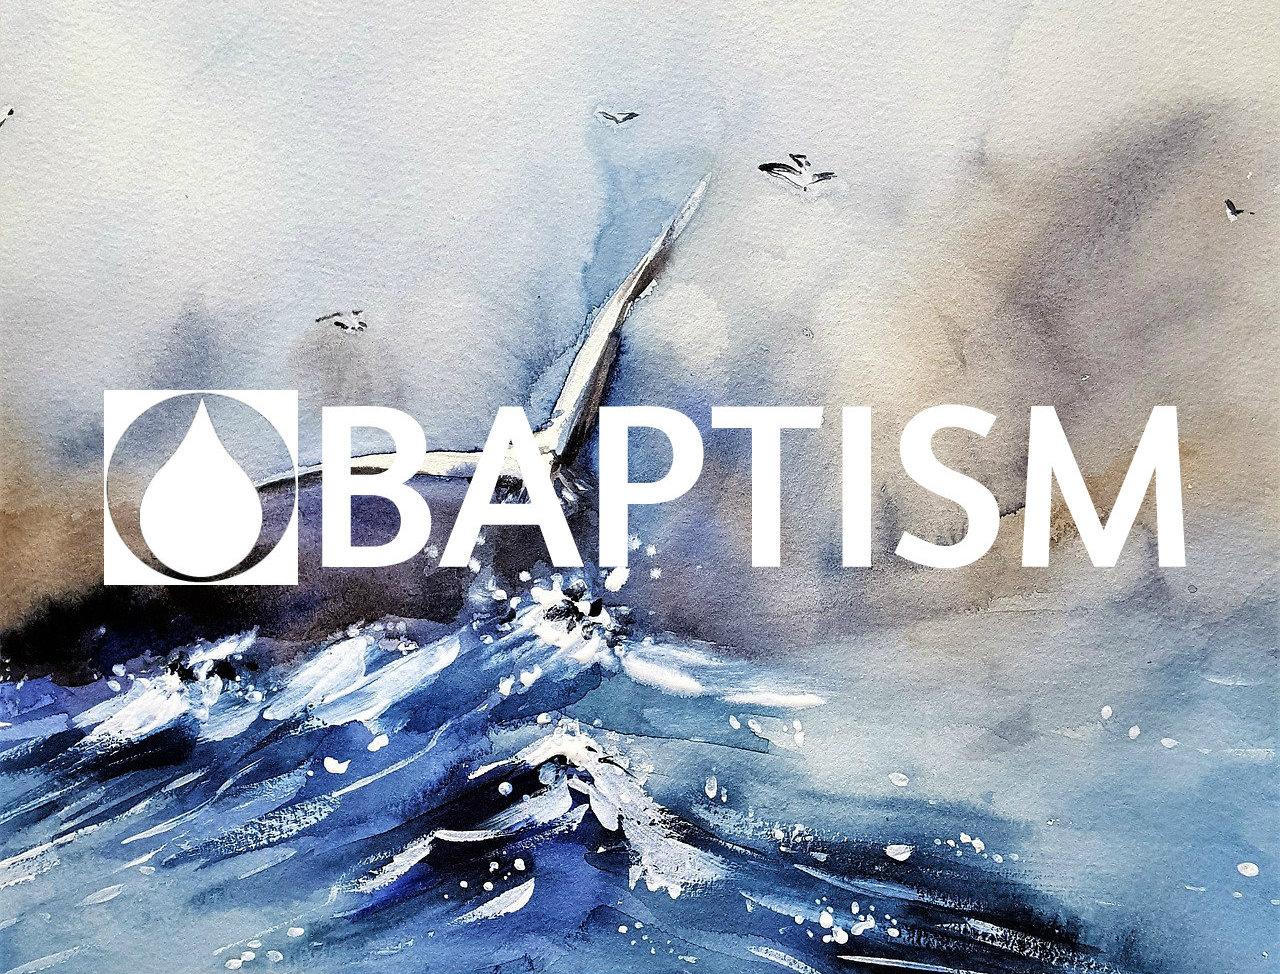 pic_baptism_4cropped.jpg